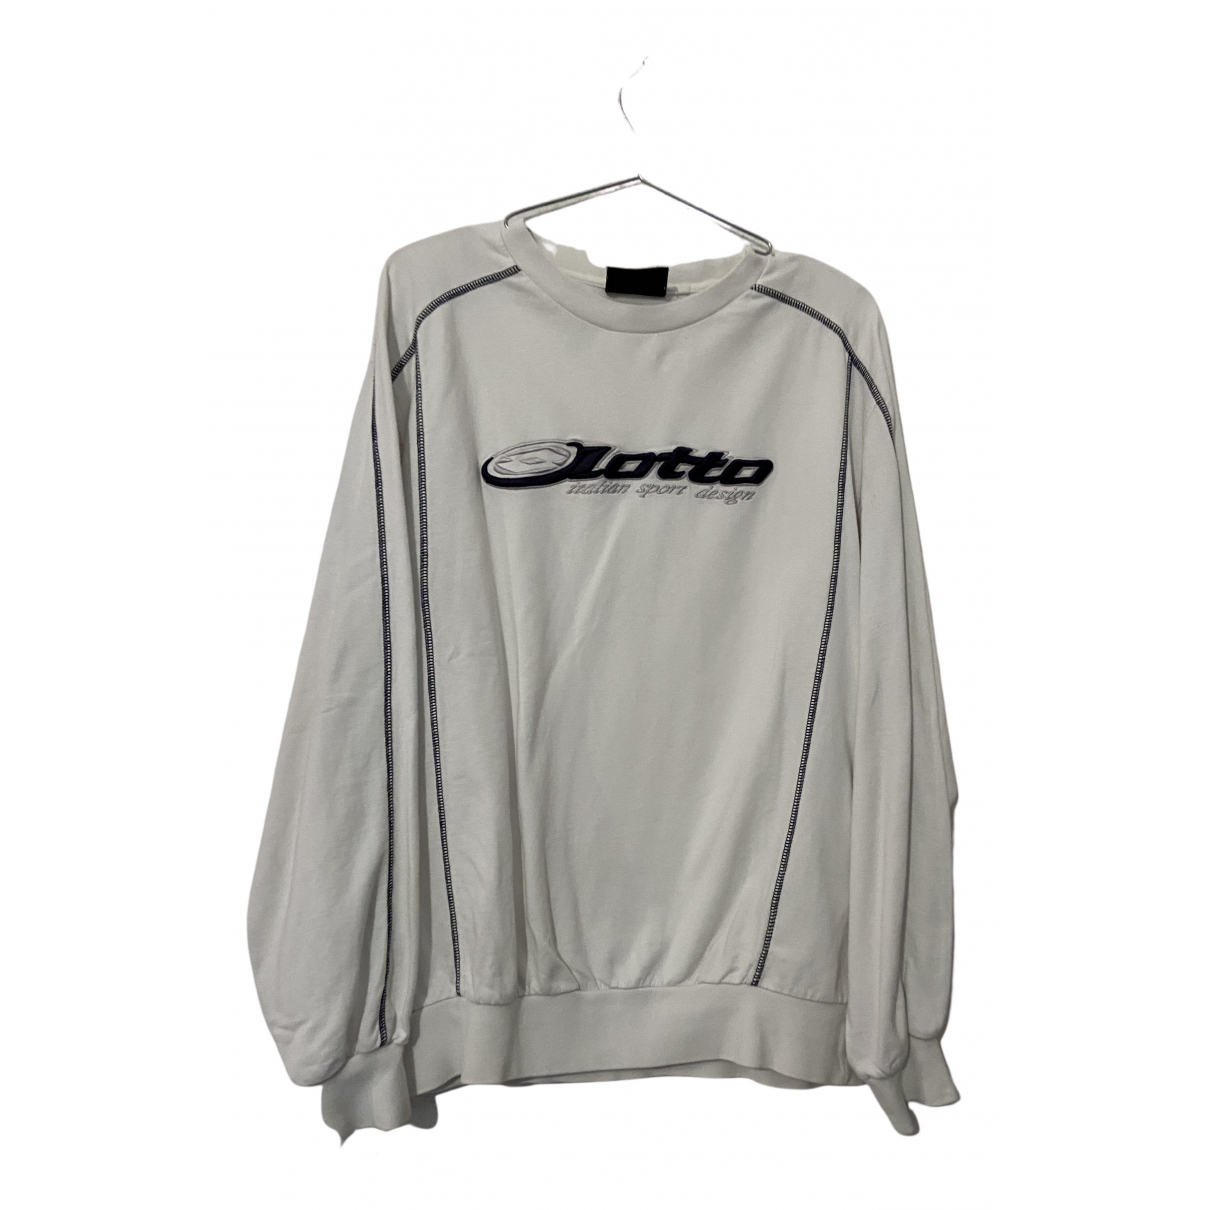 Lotto N White Cotton Knitwear & Sweatshirts for Men L International